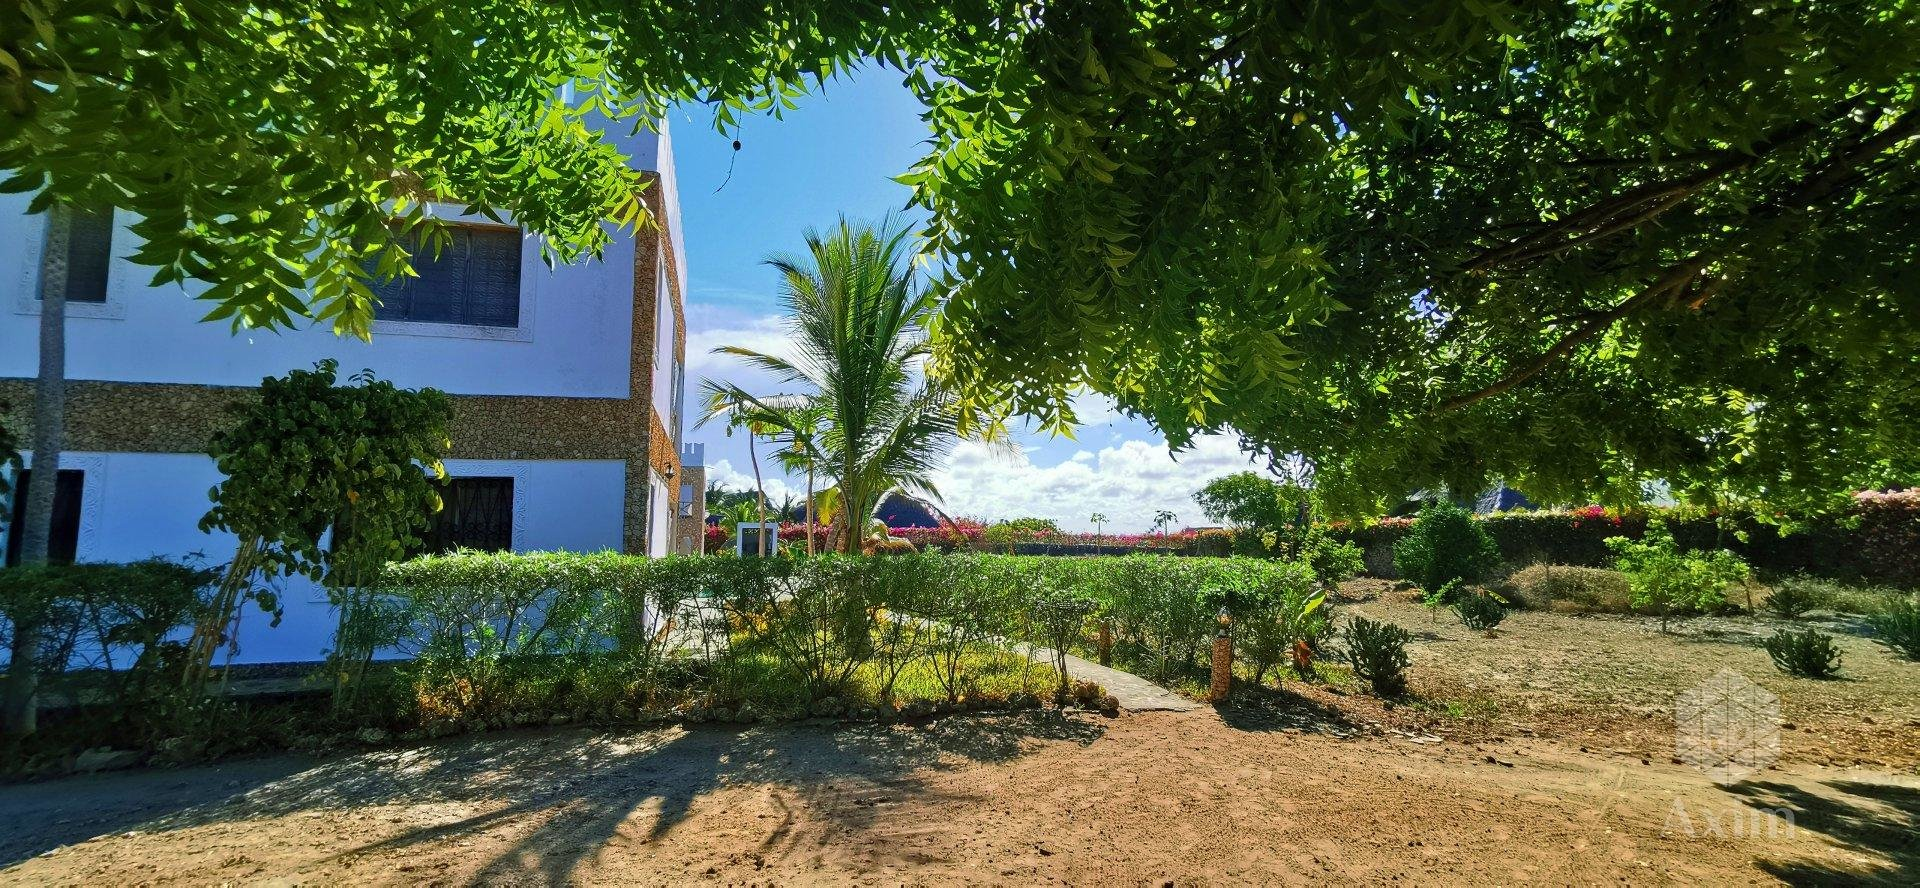 Appartements a Watamu dans un paradis tropical